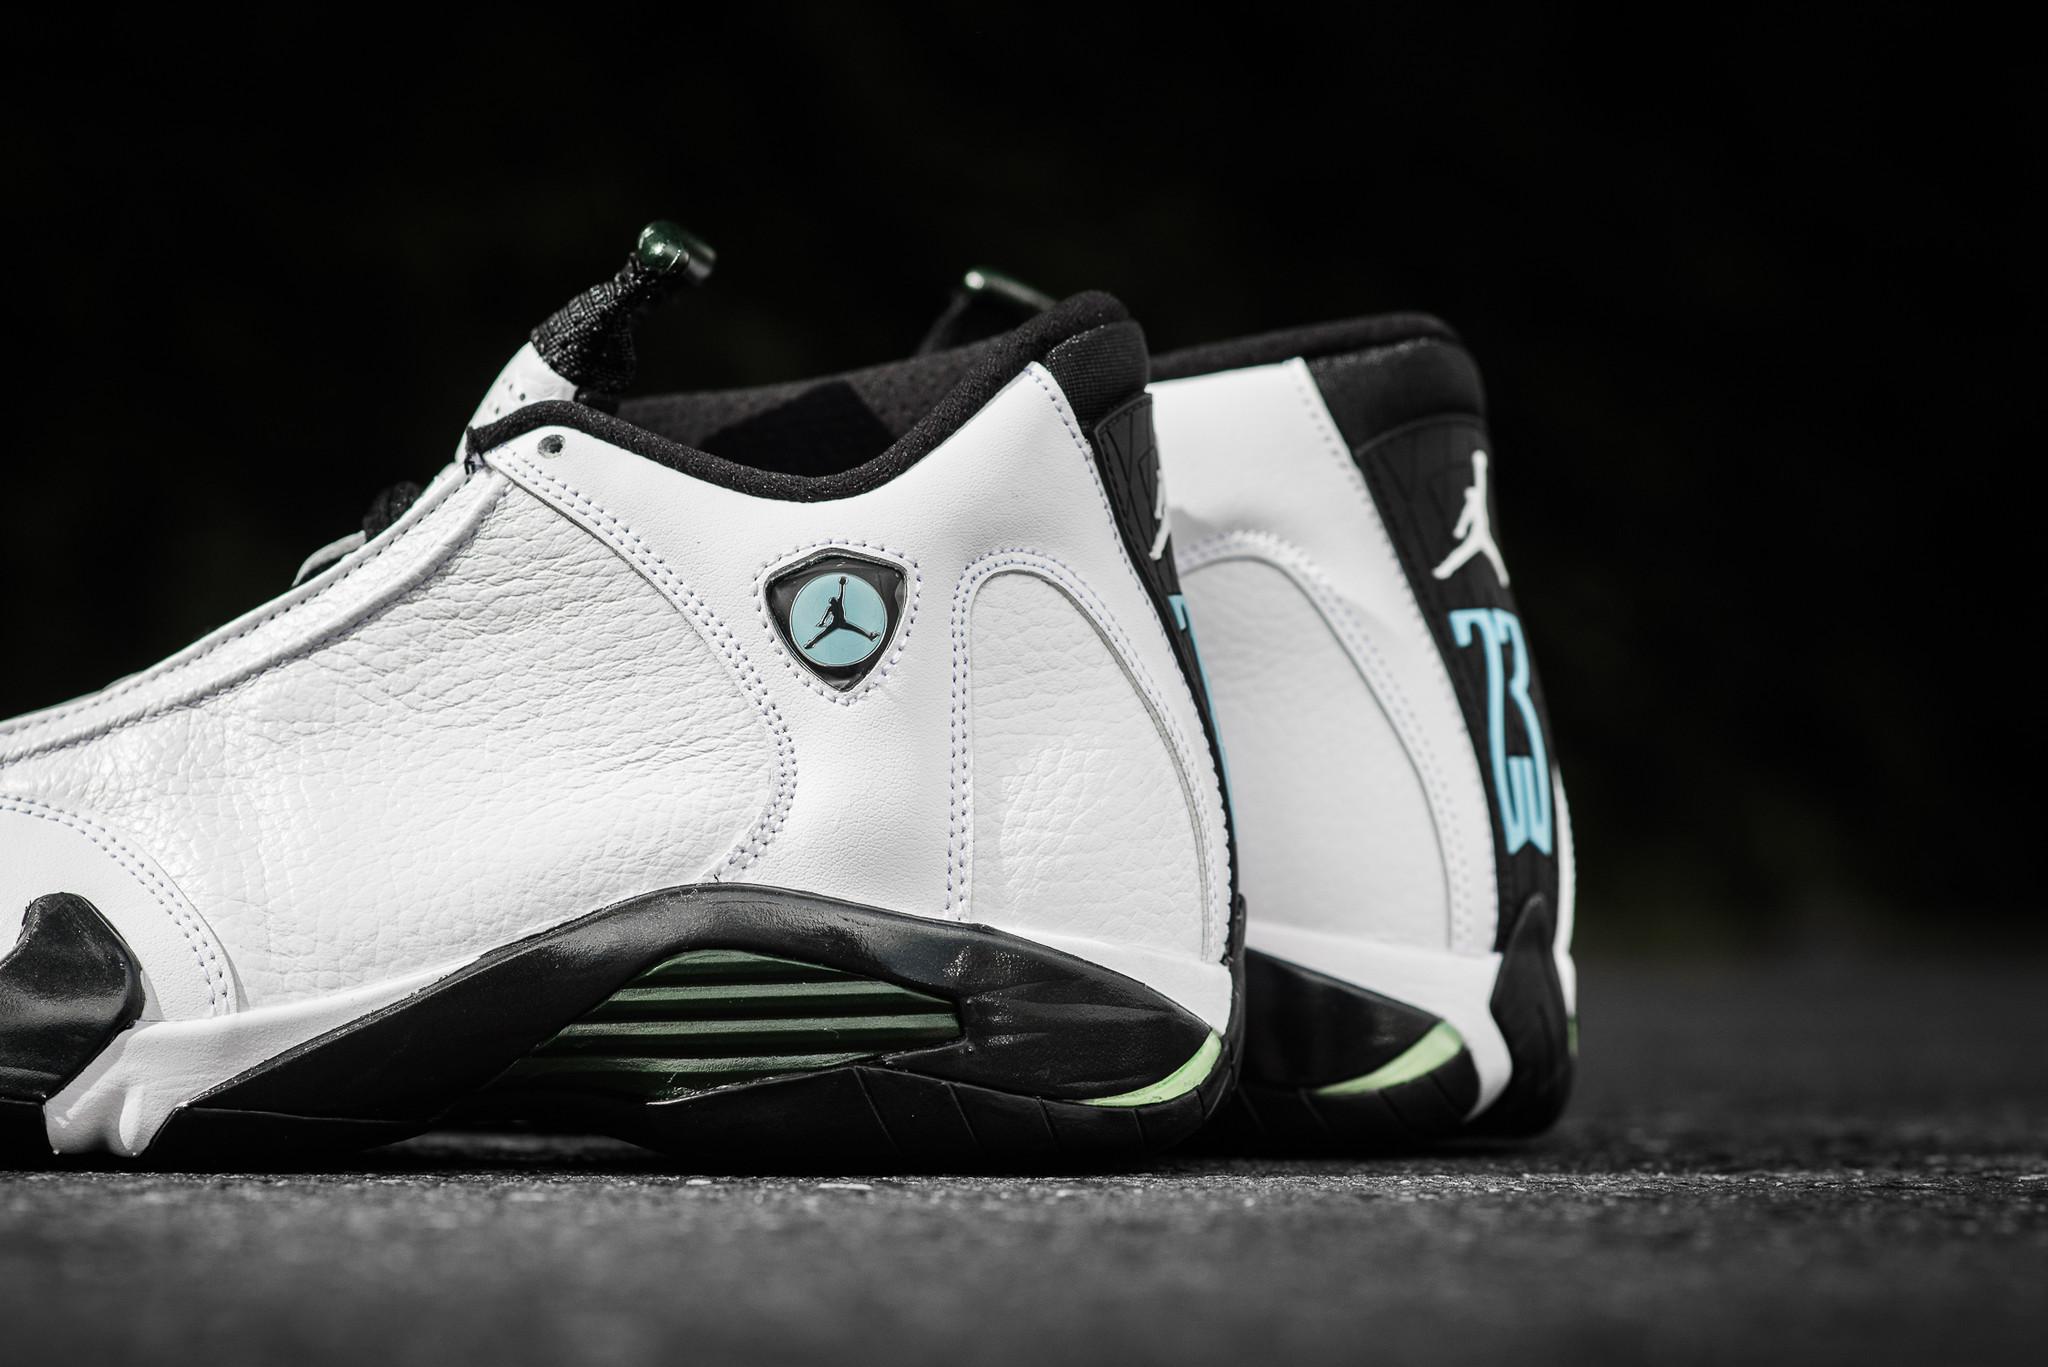 timeless design b8ce3 79929 Air Jordan 14 Oxidized Green (2016) • KicksOnFire.com